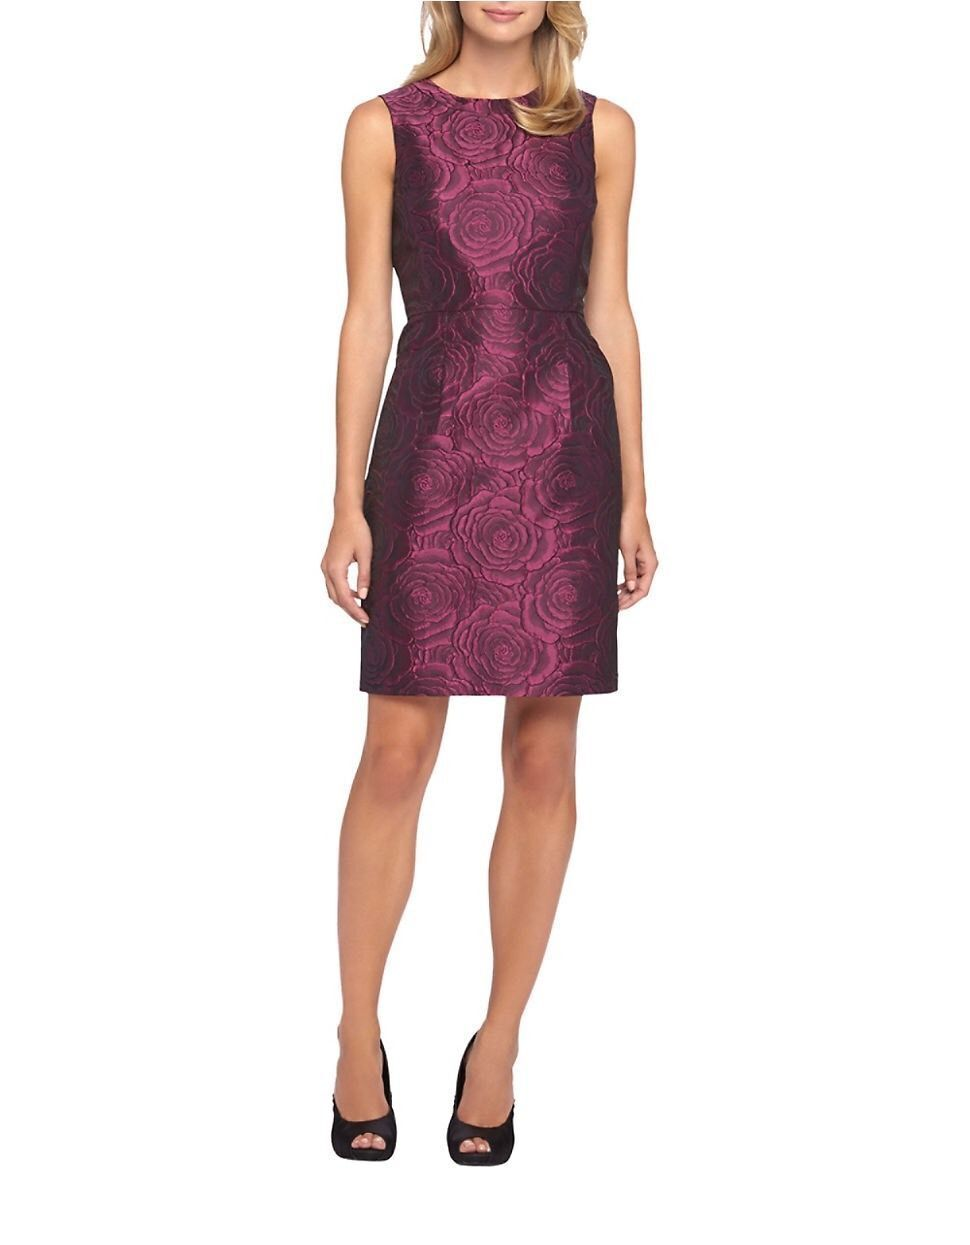 NWT Tahari Woherren lila Rosa Jacquard Sheath Dress w Slant Pockets  Retail